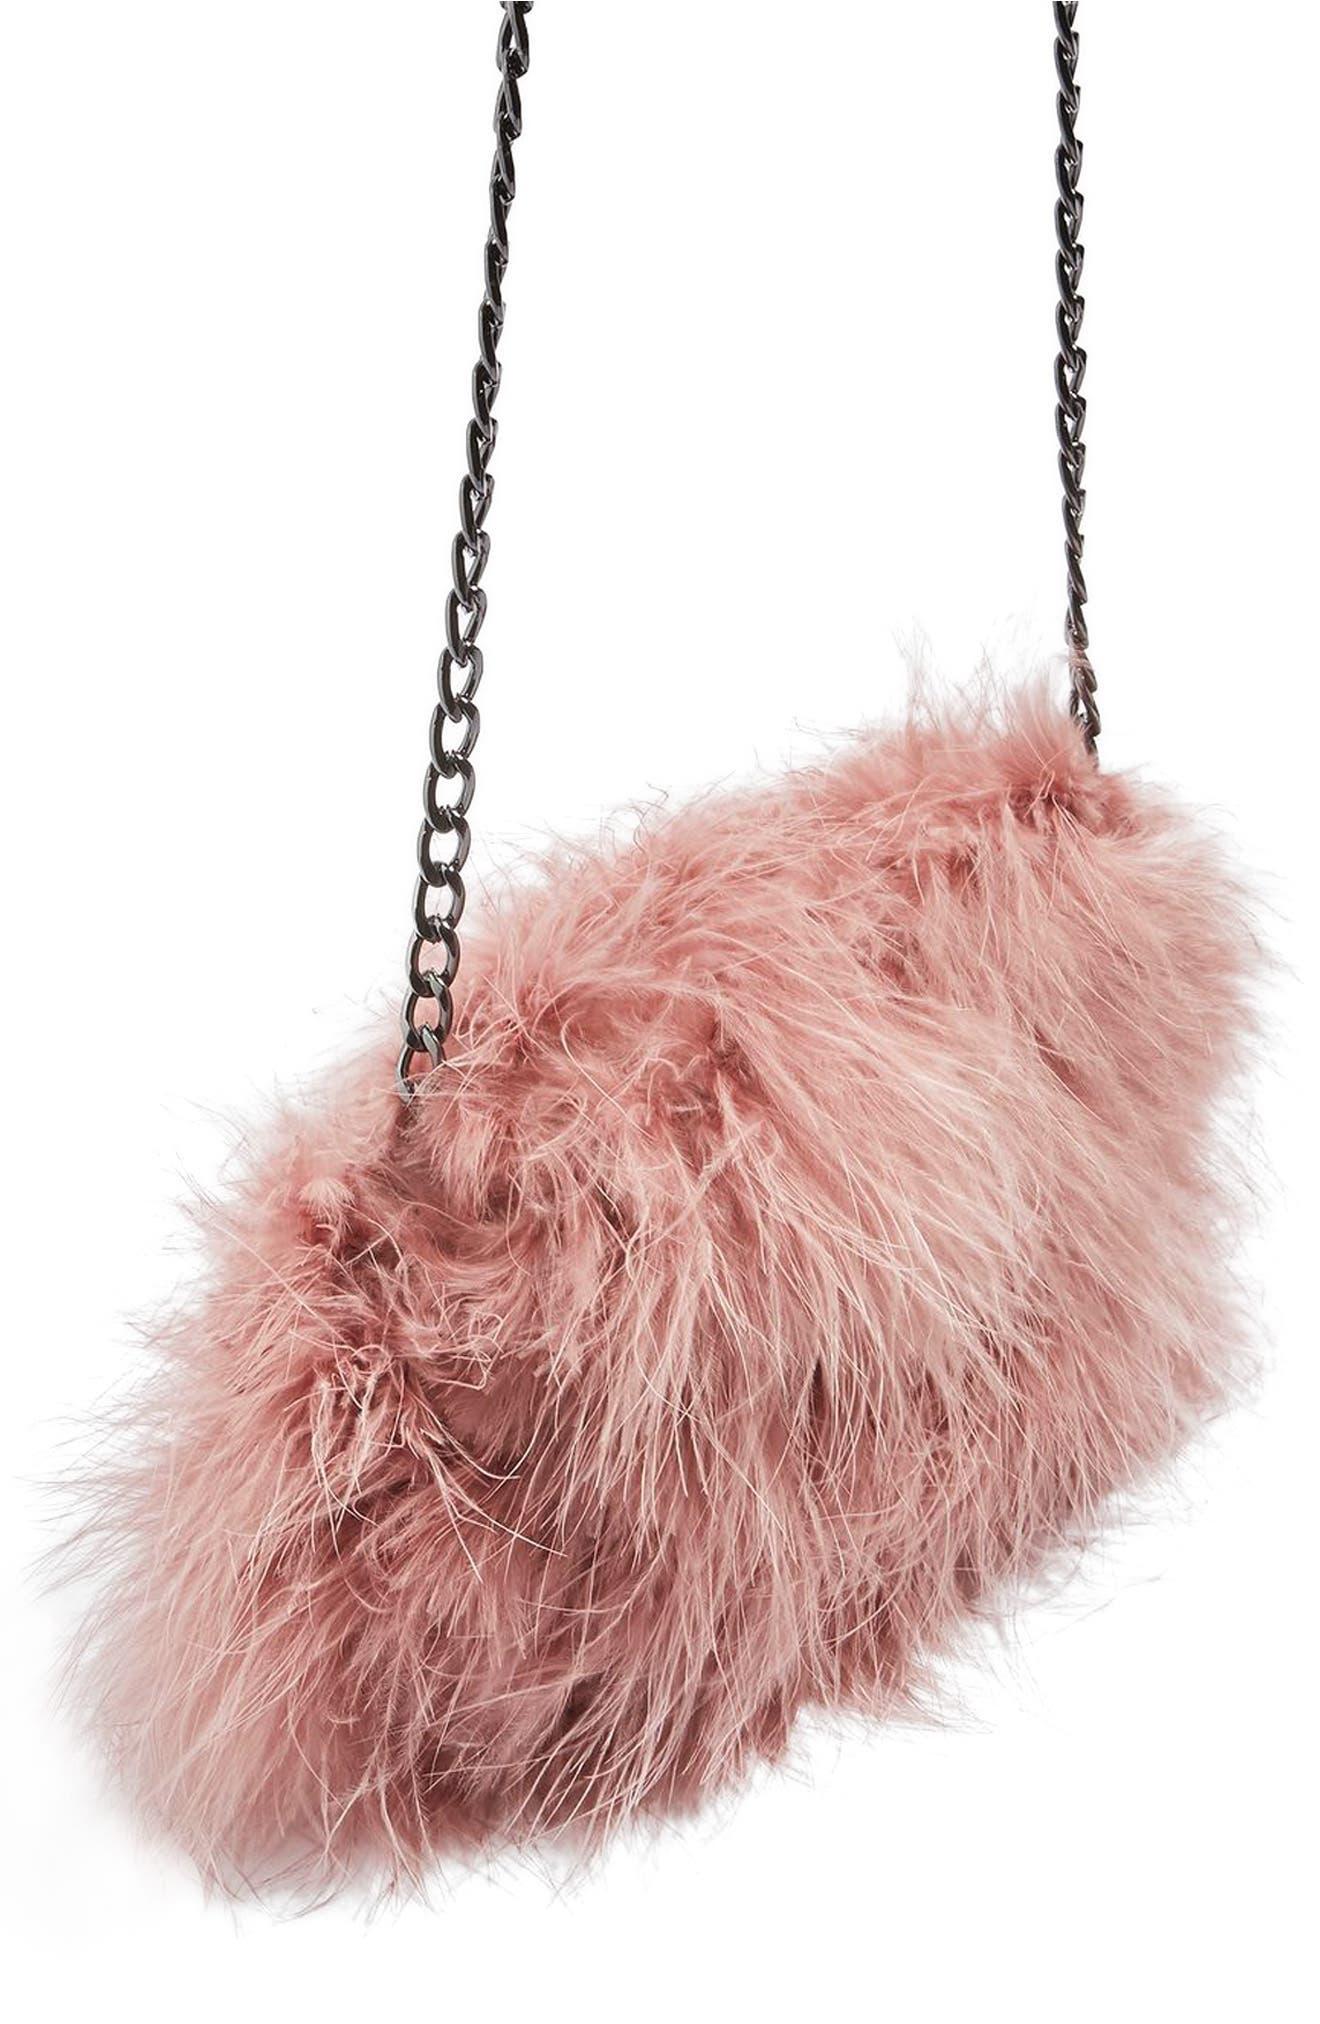 Alternate Image 1 Selected - Topshop Riga Feather Crossbody Bag